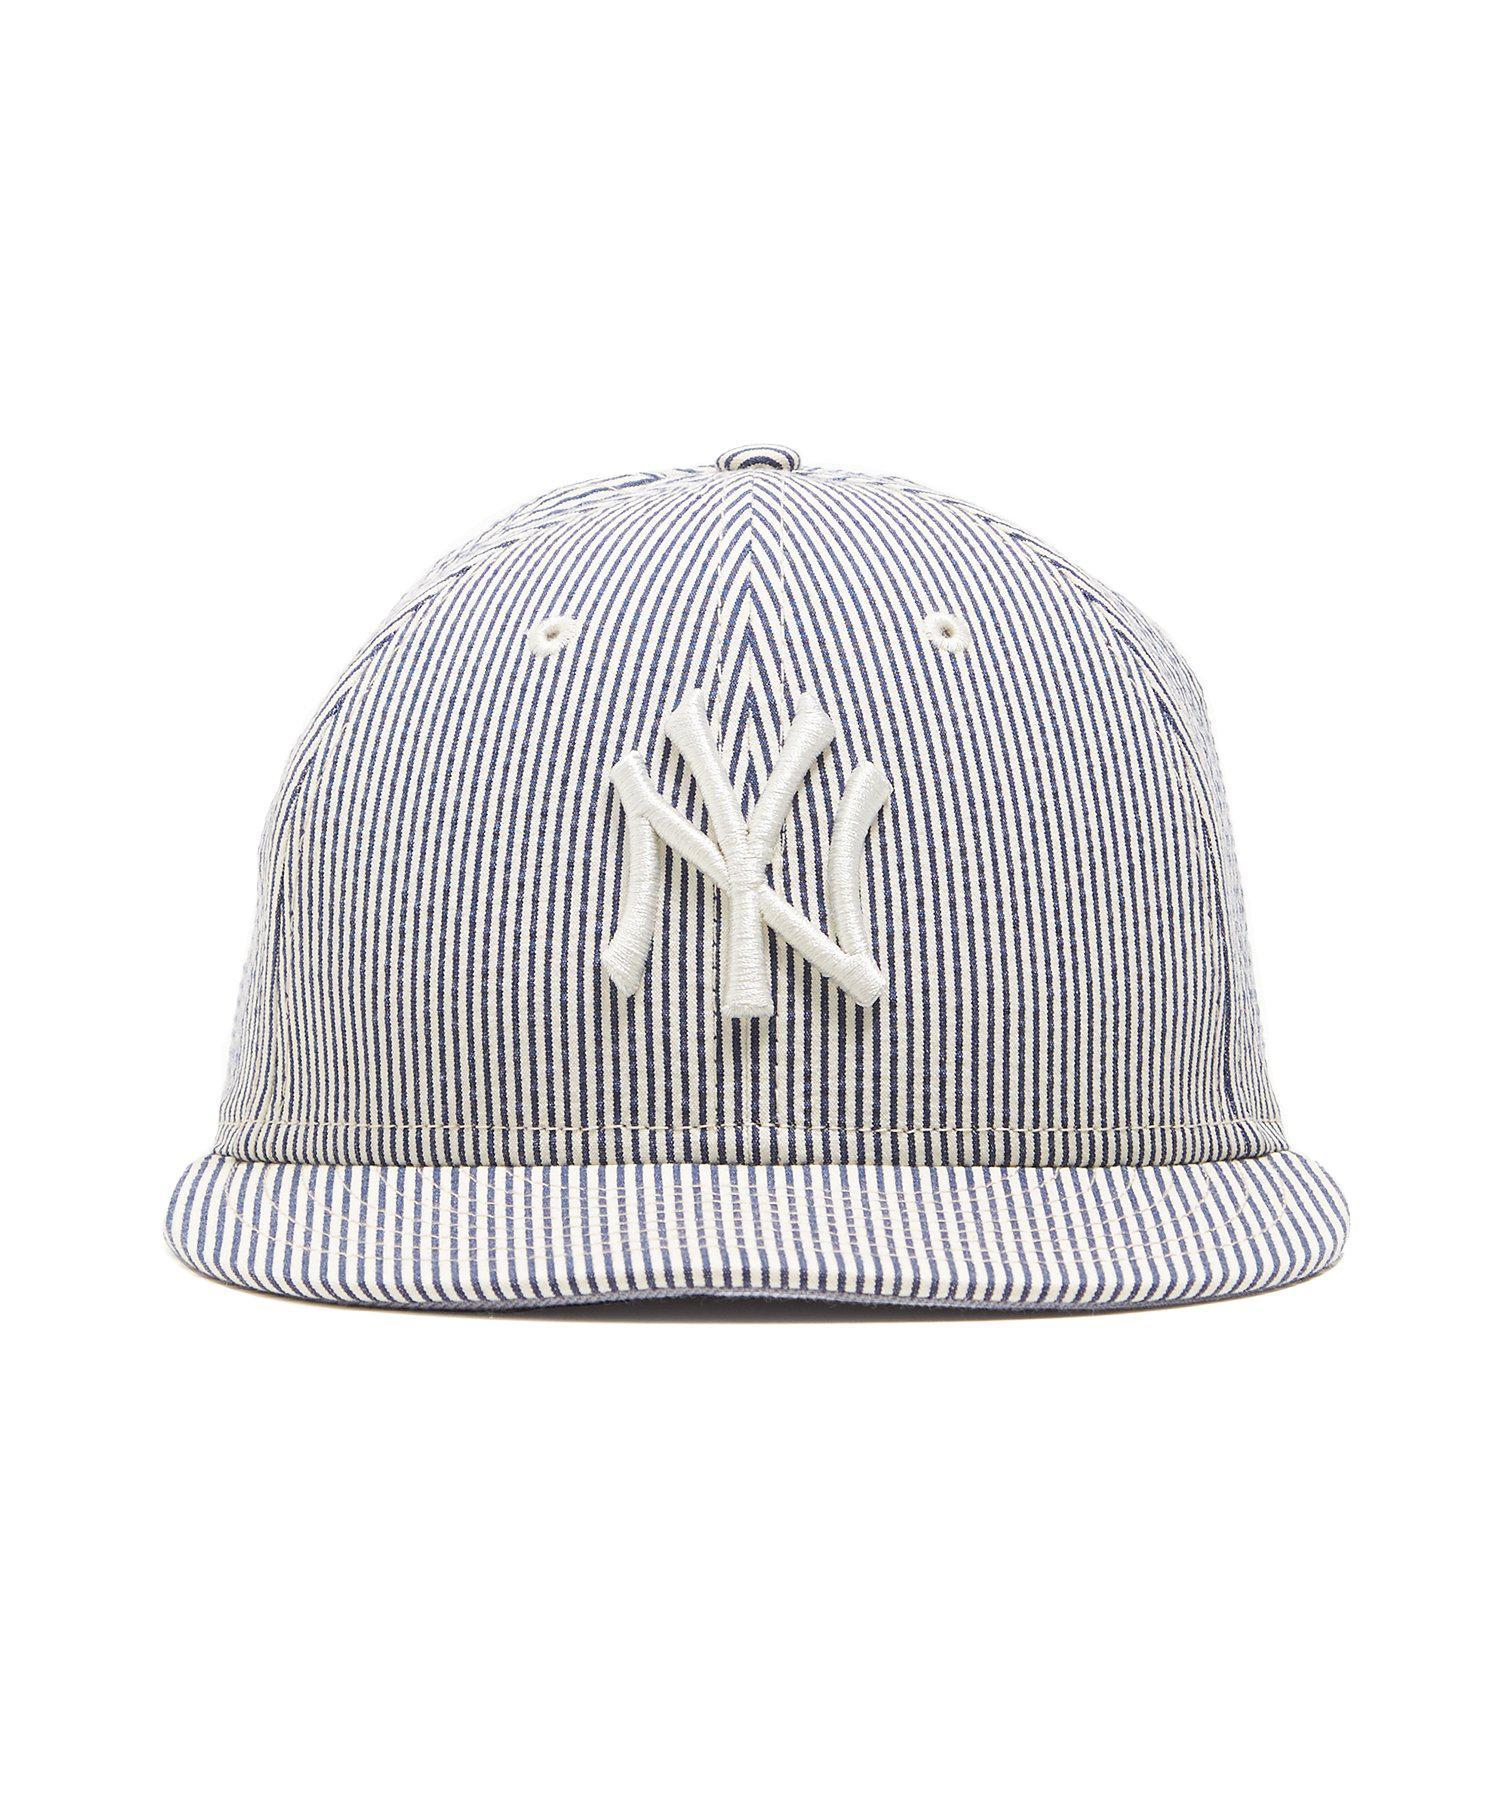 ac684e61d51 NEW ERA HATS New York Yankees Cap In Seersucker in Blue for Men - Lyst